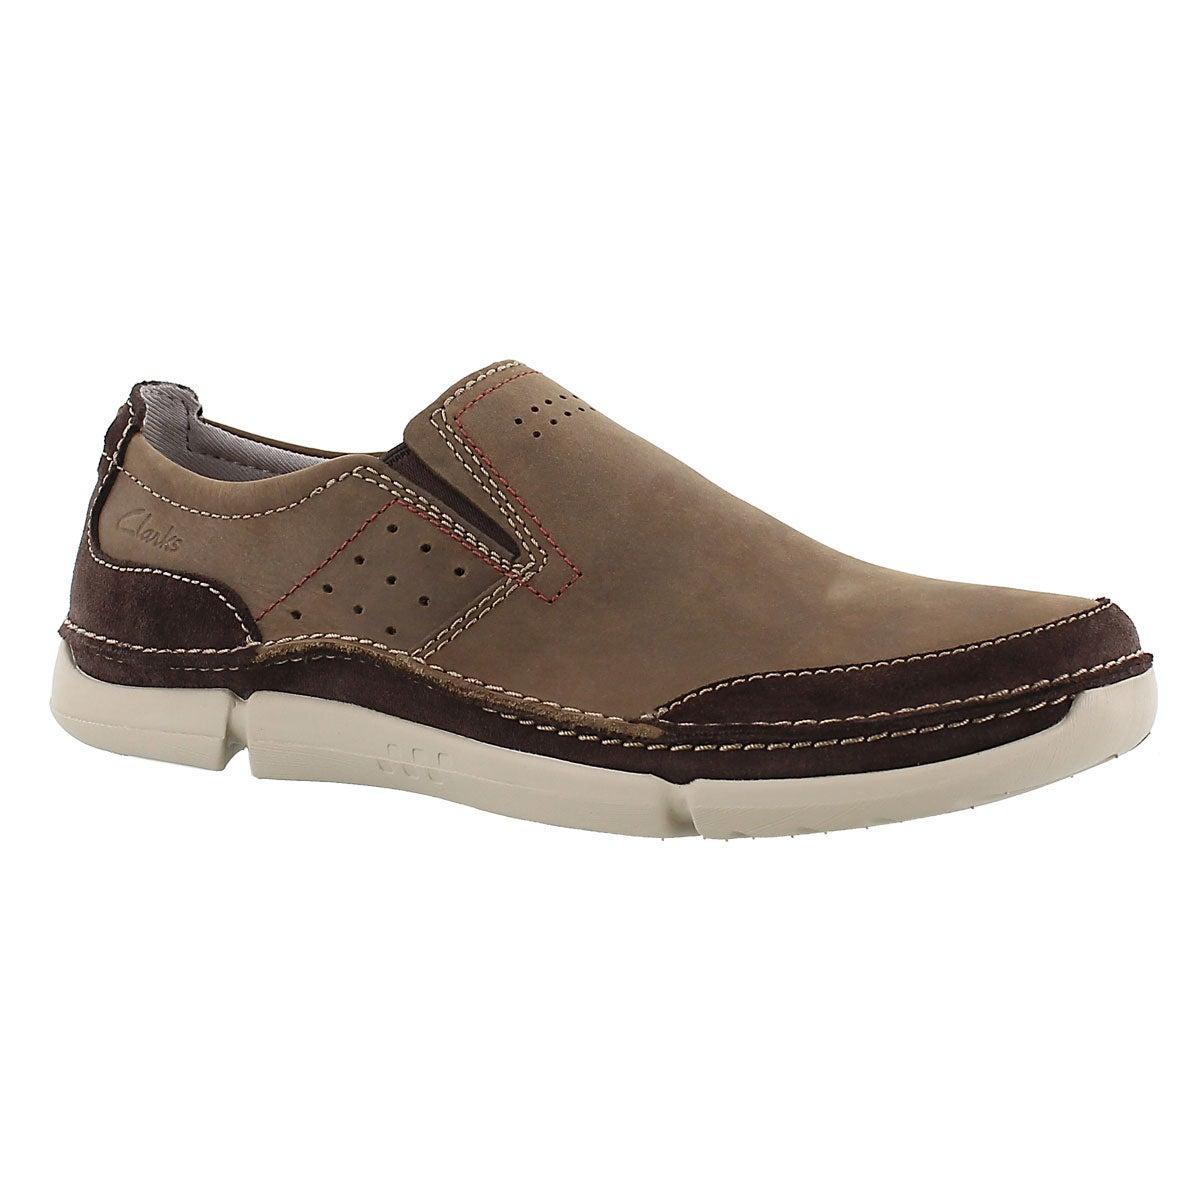 Mns Trikeyon Step brown casual slip on